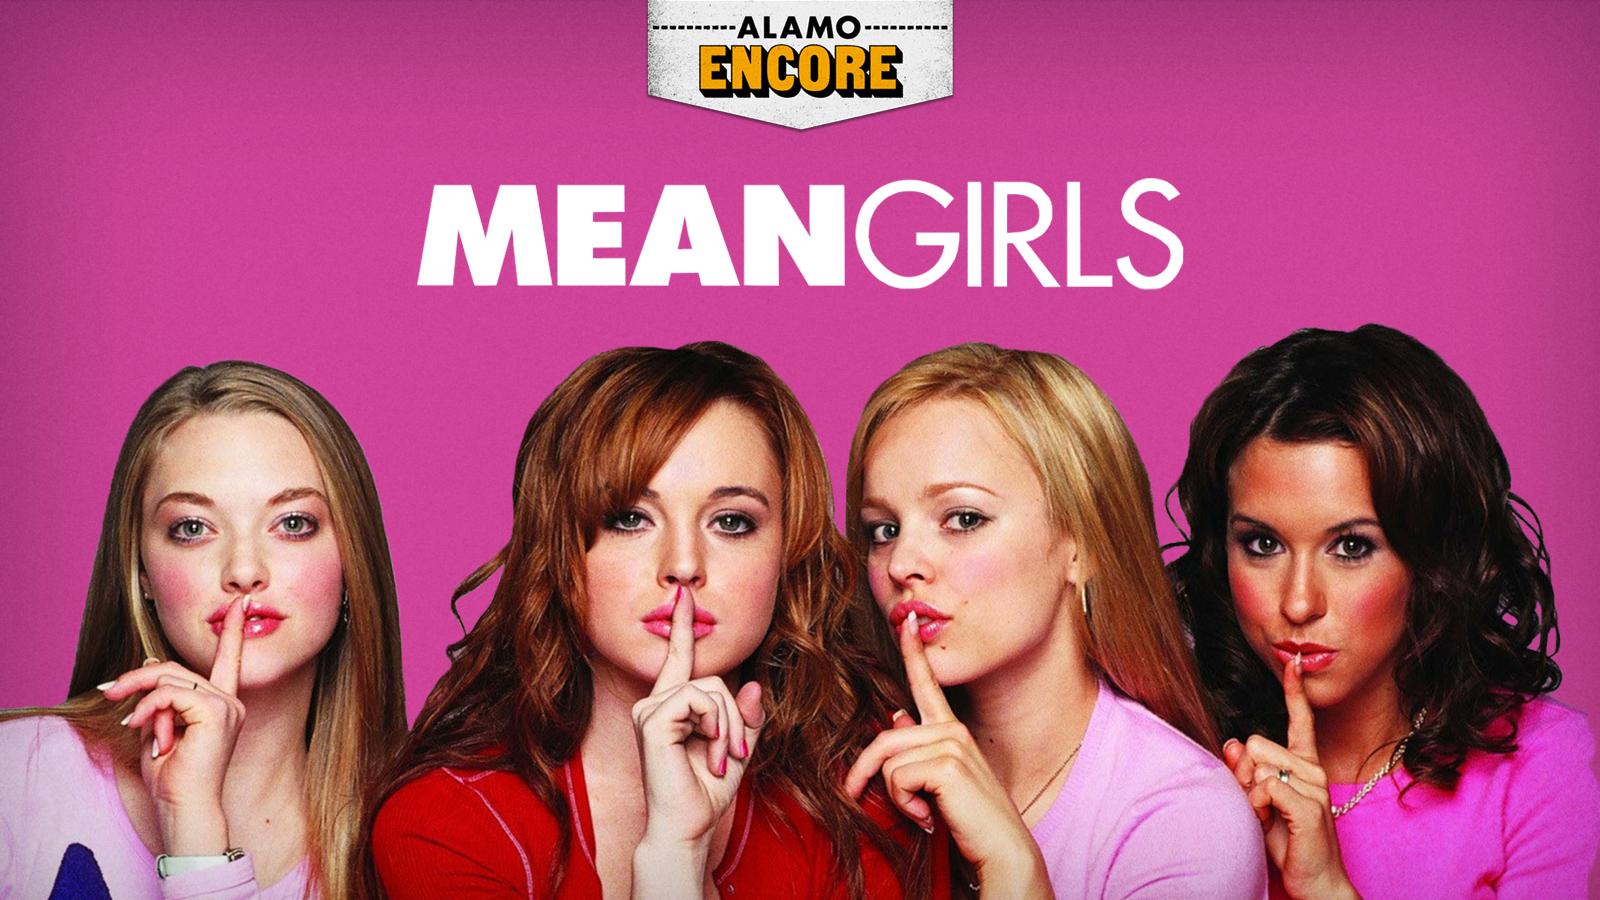 mean girls screenings | alamo drafthouse cinema